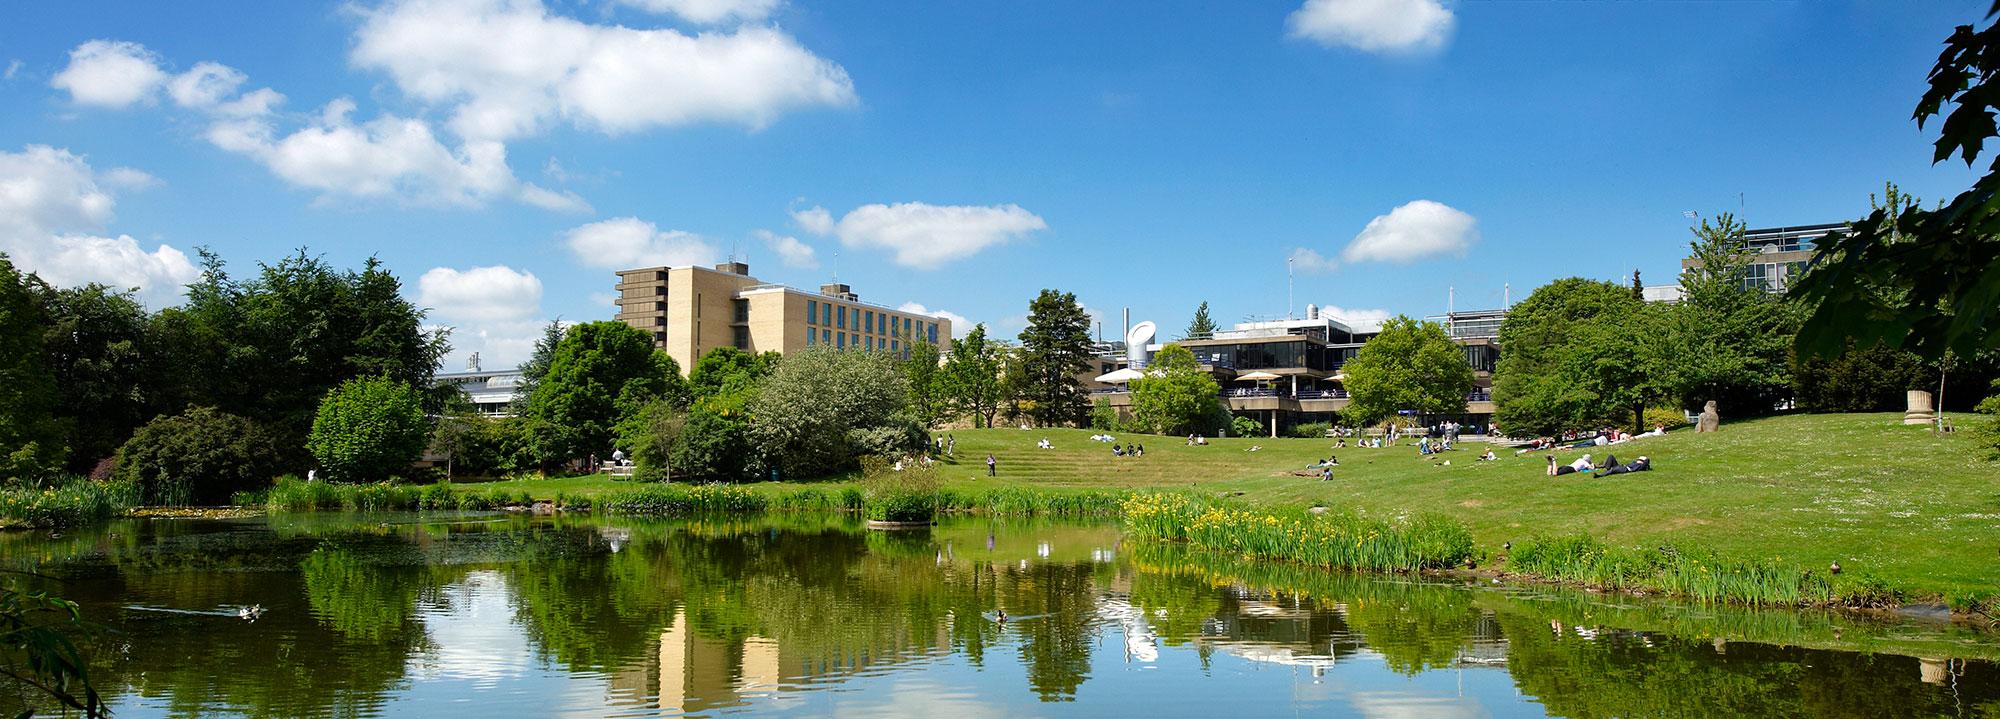 Study in UK - Bath University